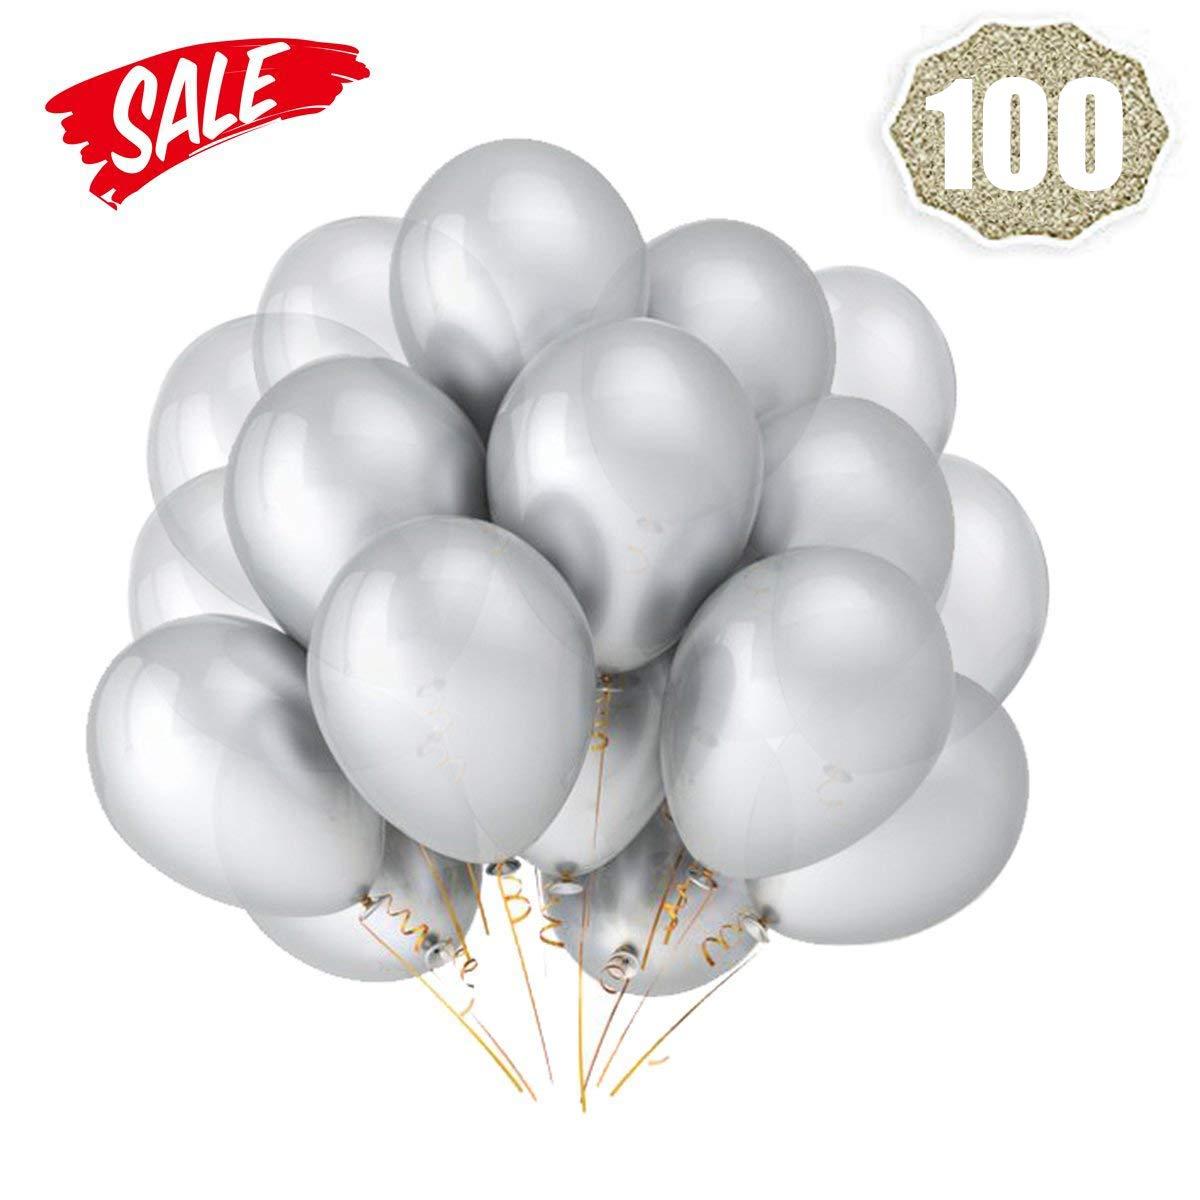 Amazon.com: Silver Balloons Hovebeaty 12 Inches thicken Latex ...